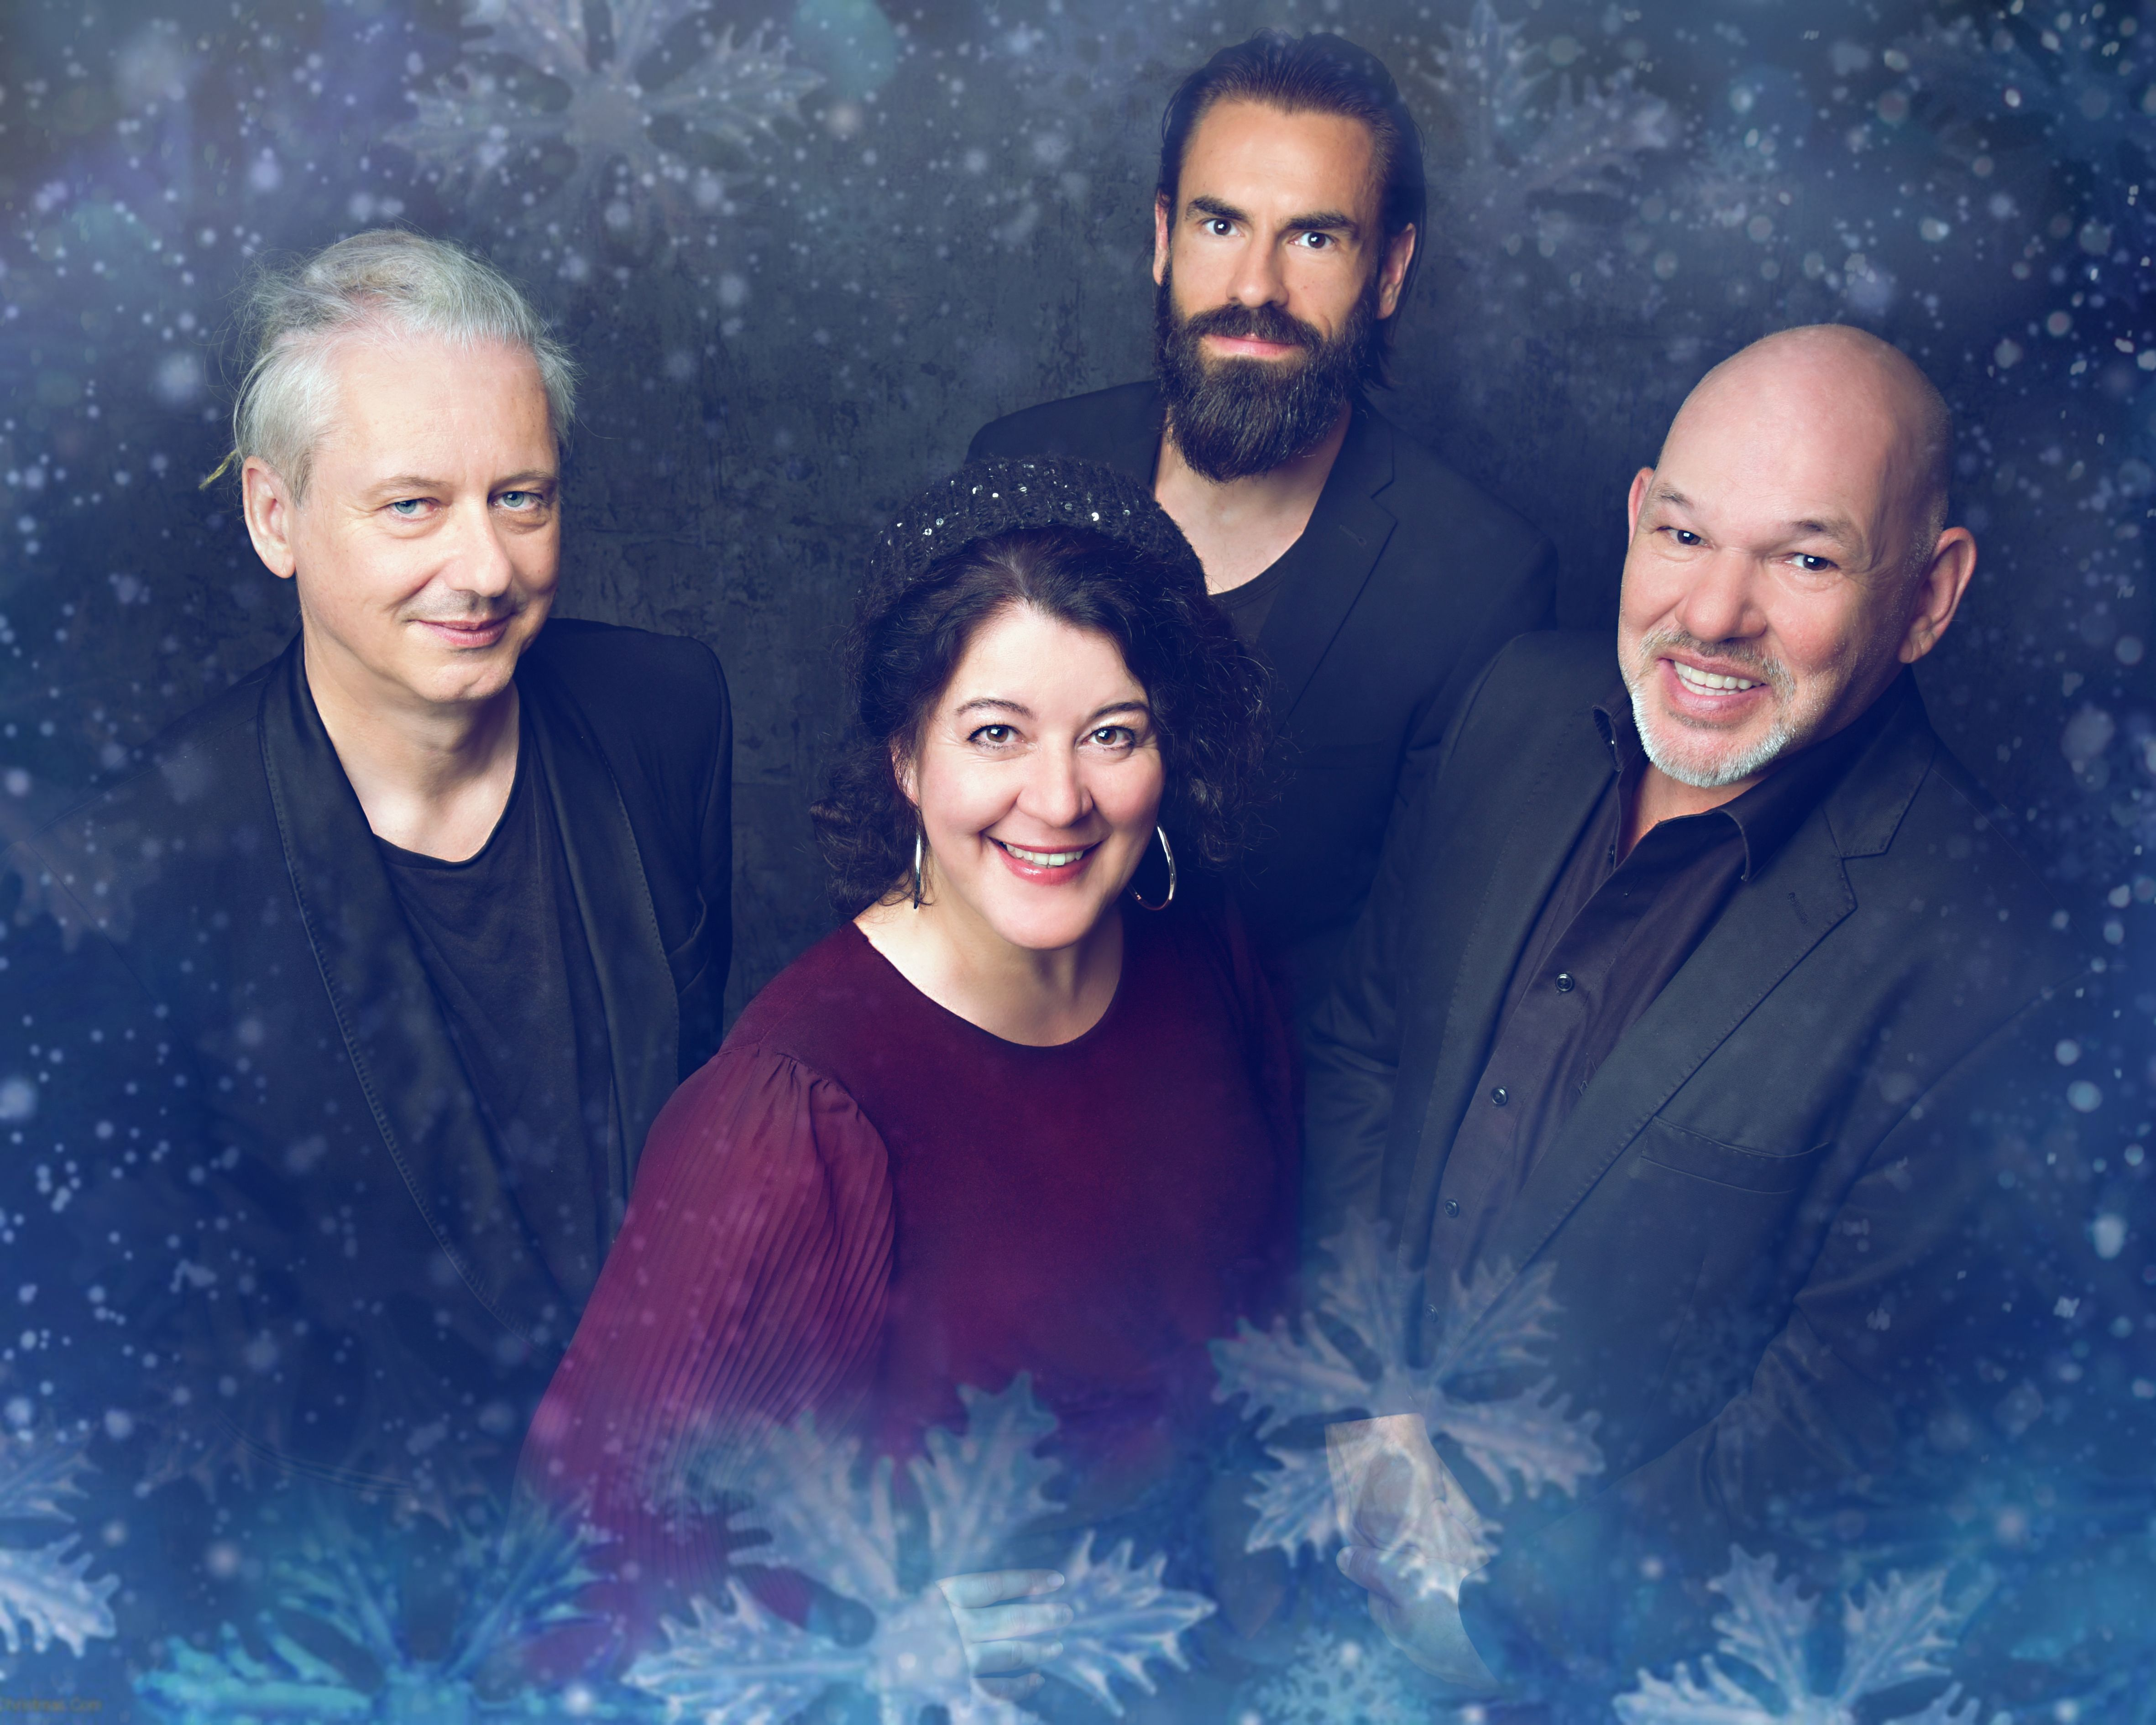 mo-band-weihnachtsbild-2019pulli